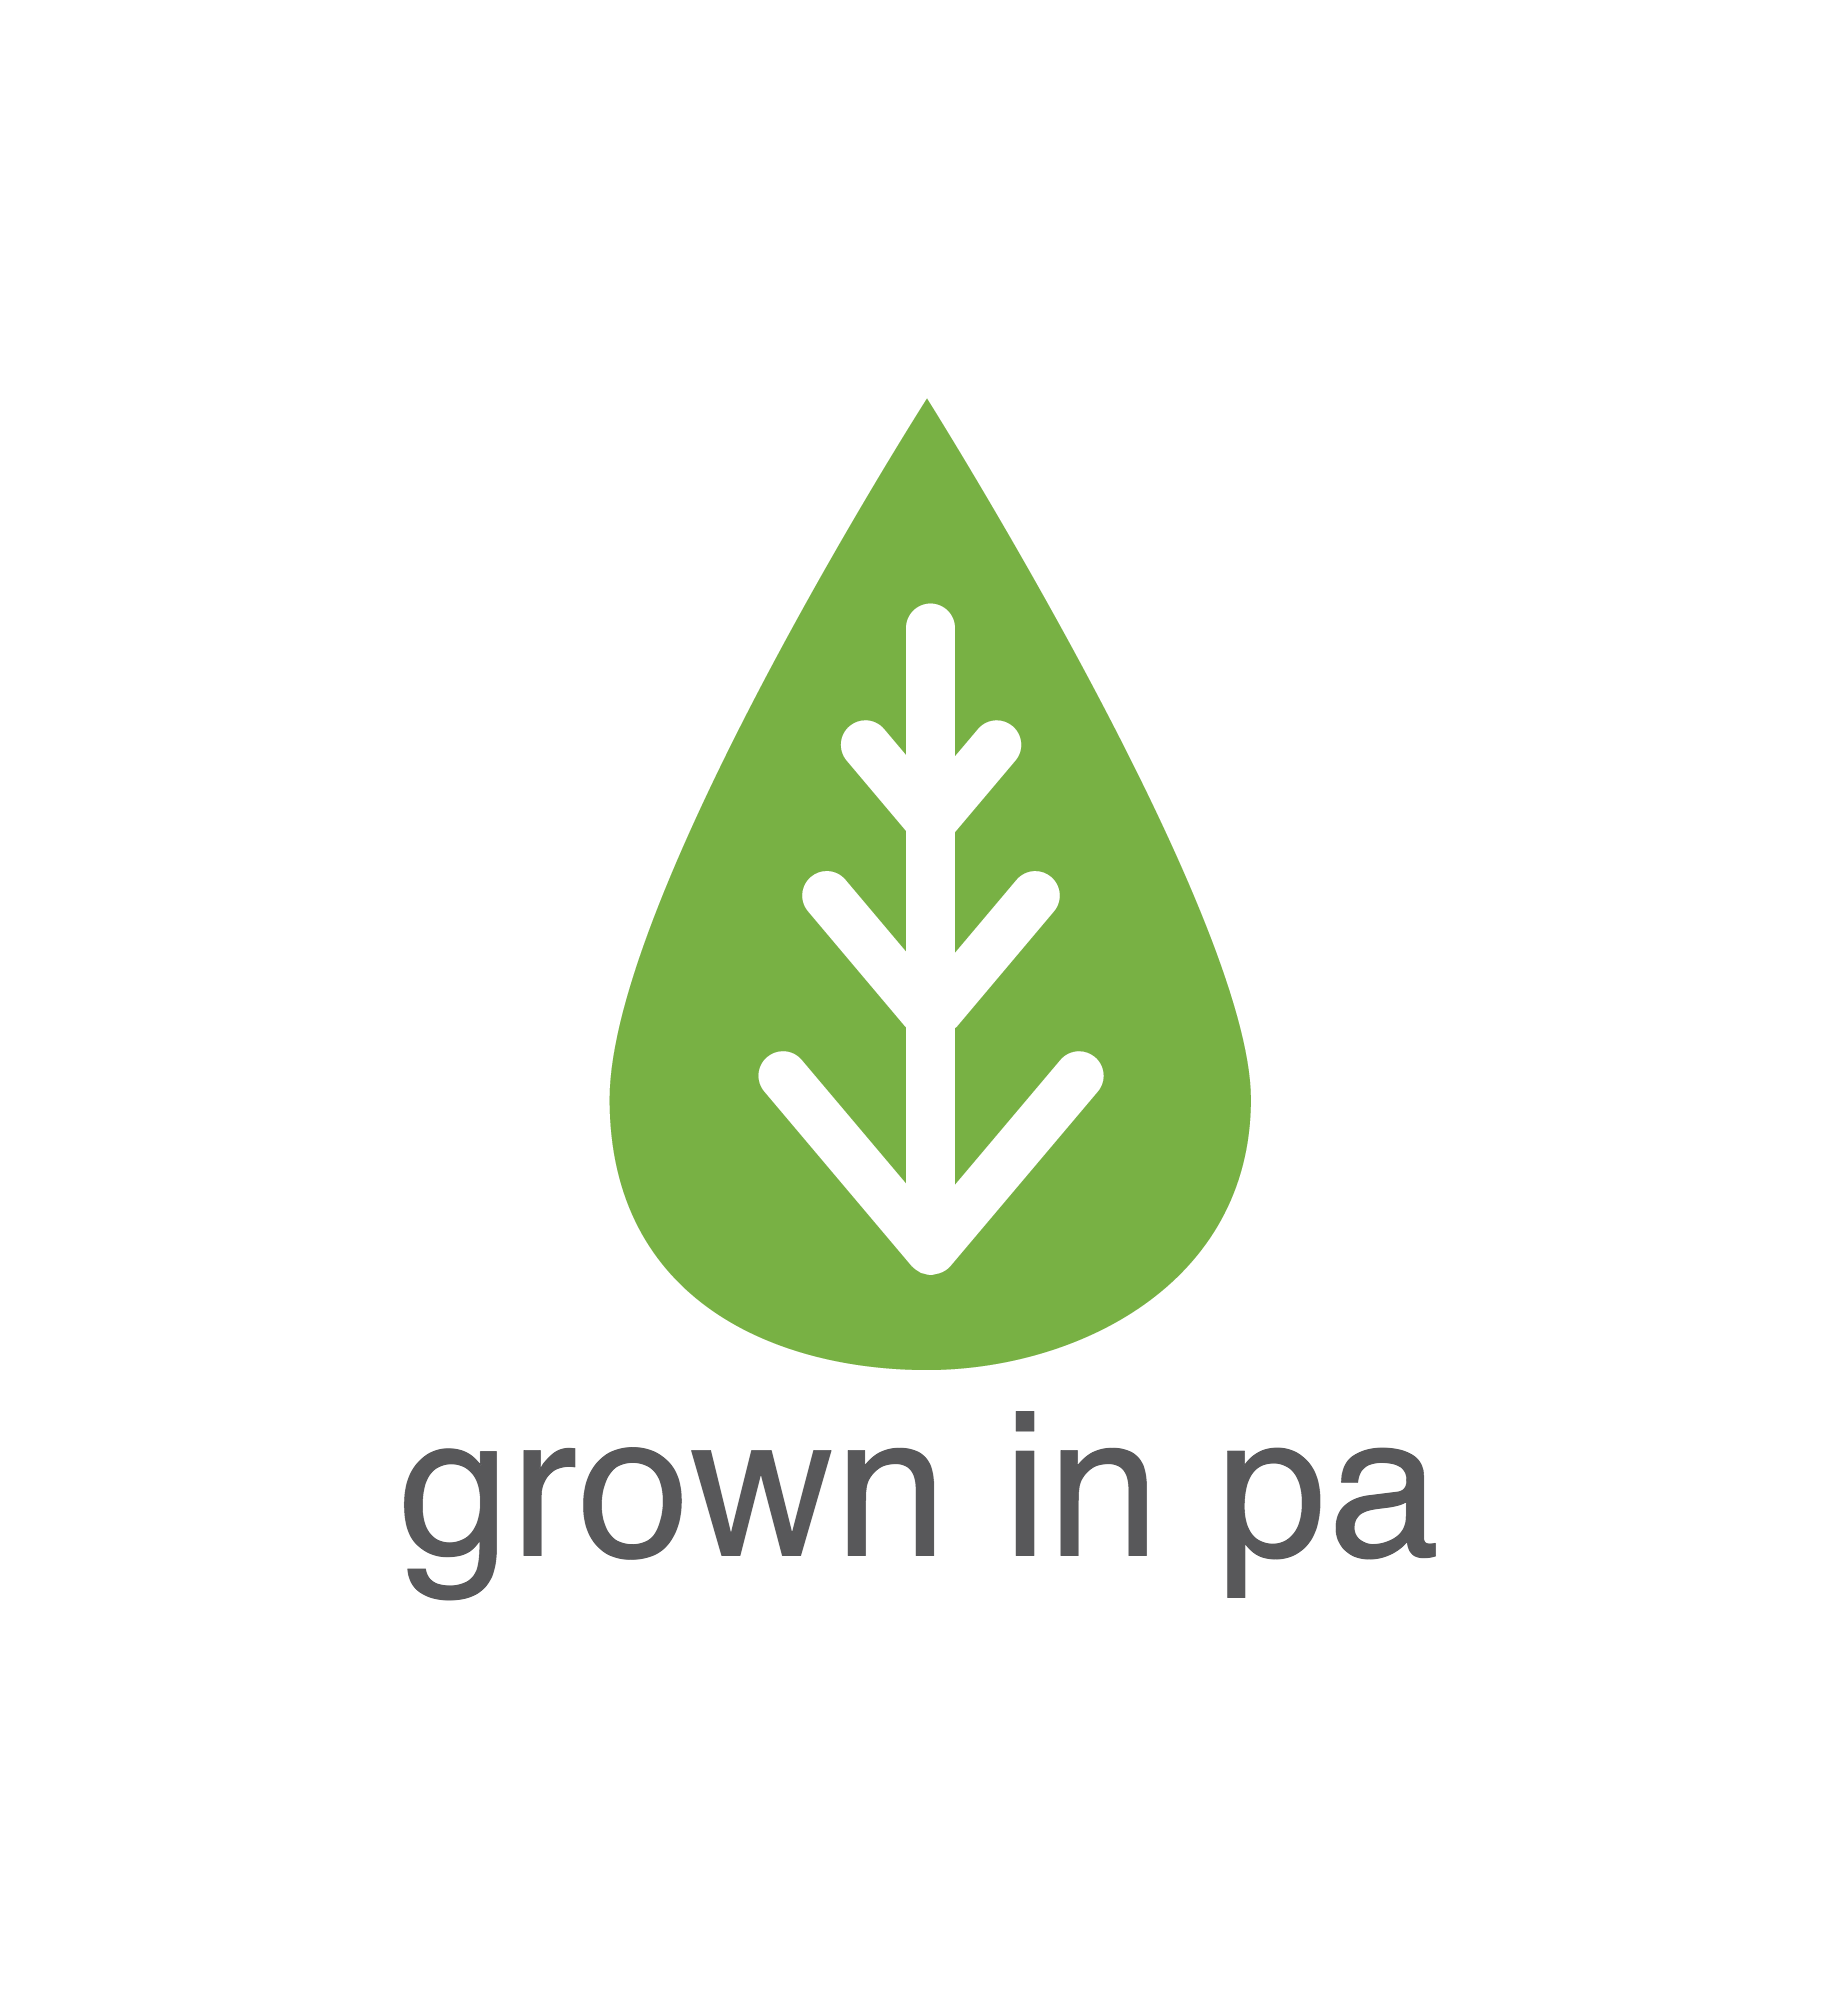 grown in pa-logo.png